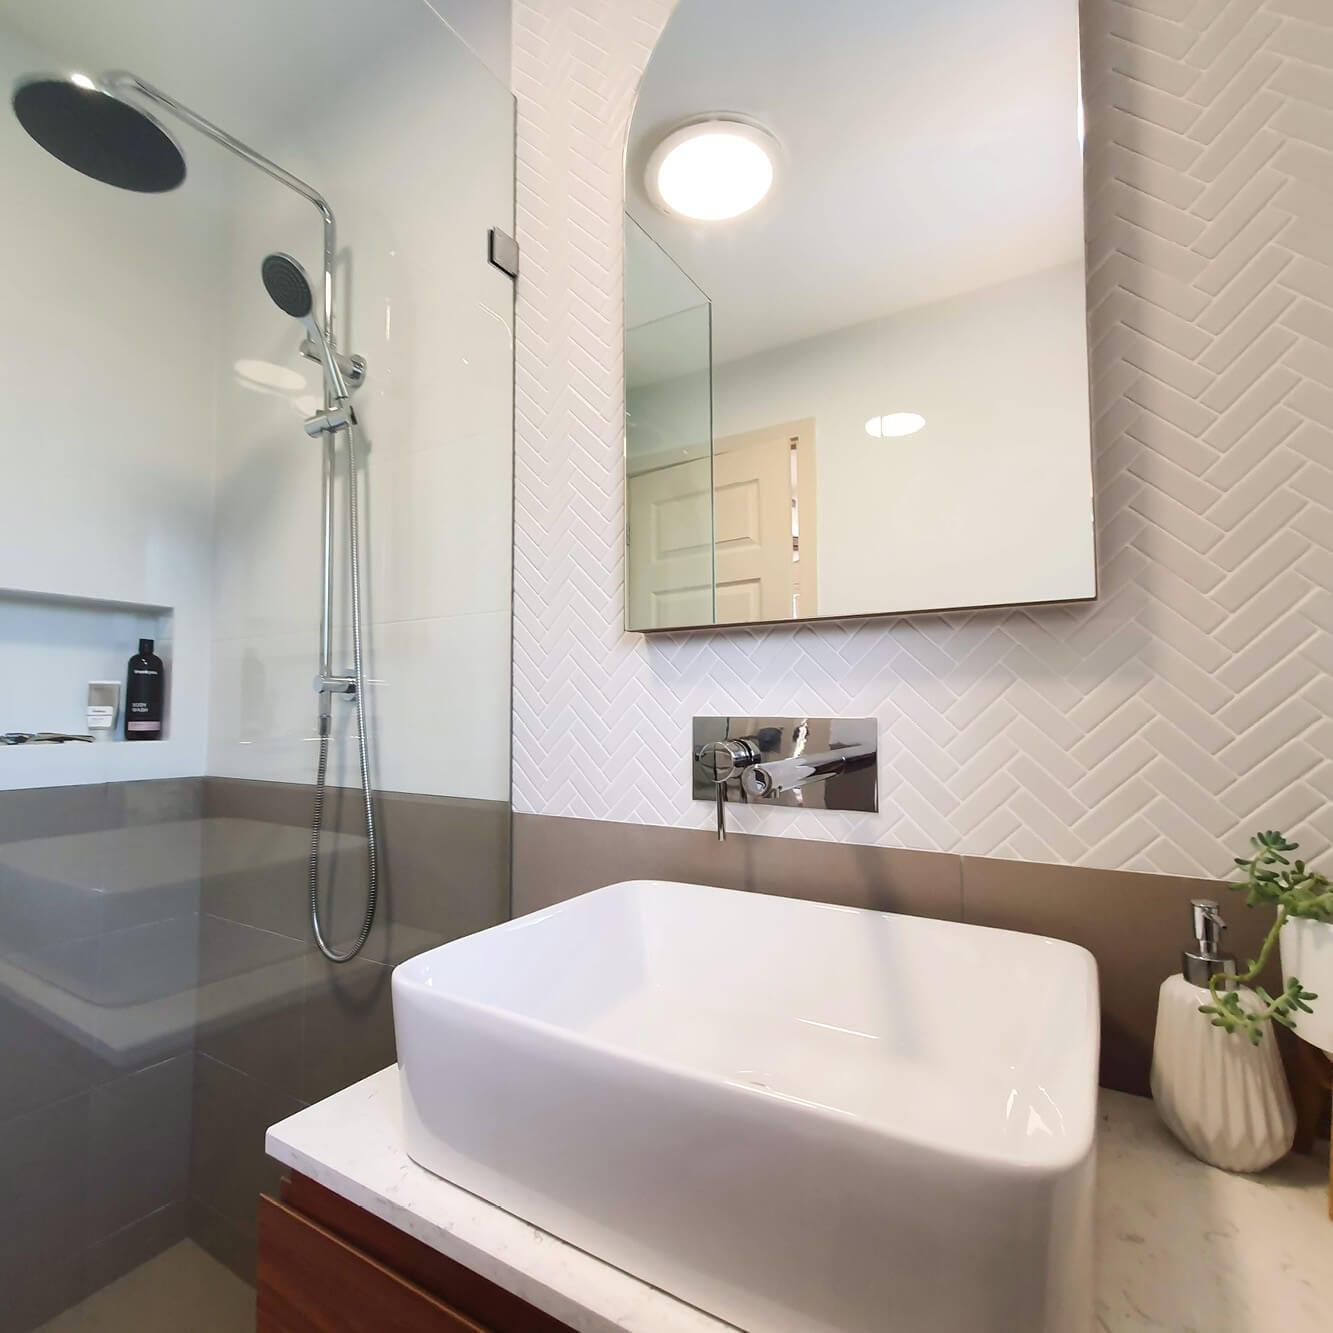 KBDi_Stephanie Webber_Bathroom_Square